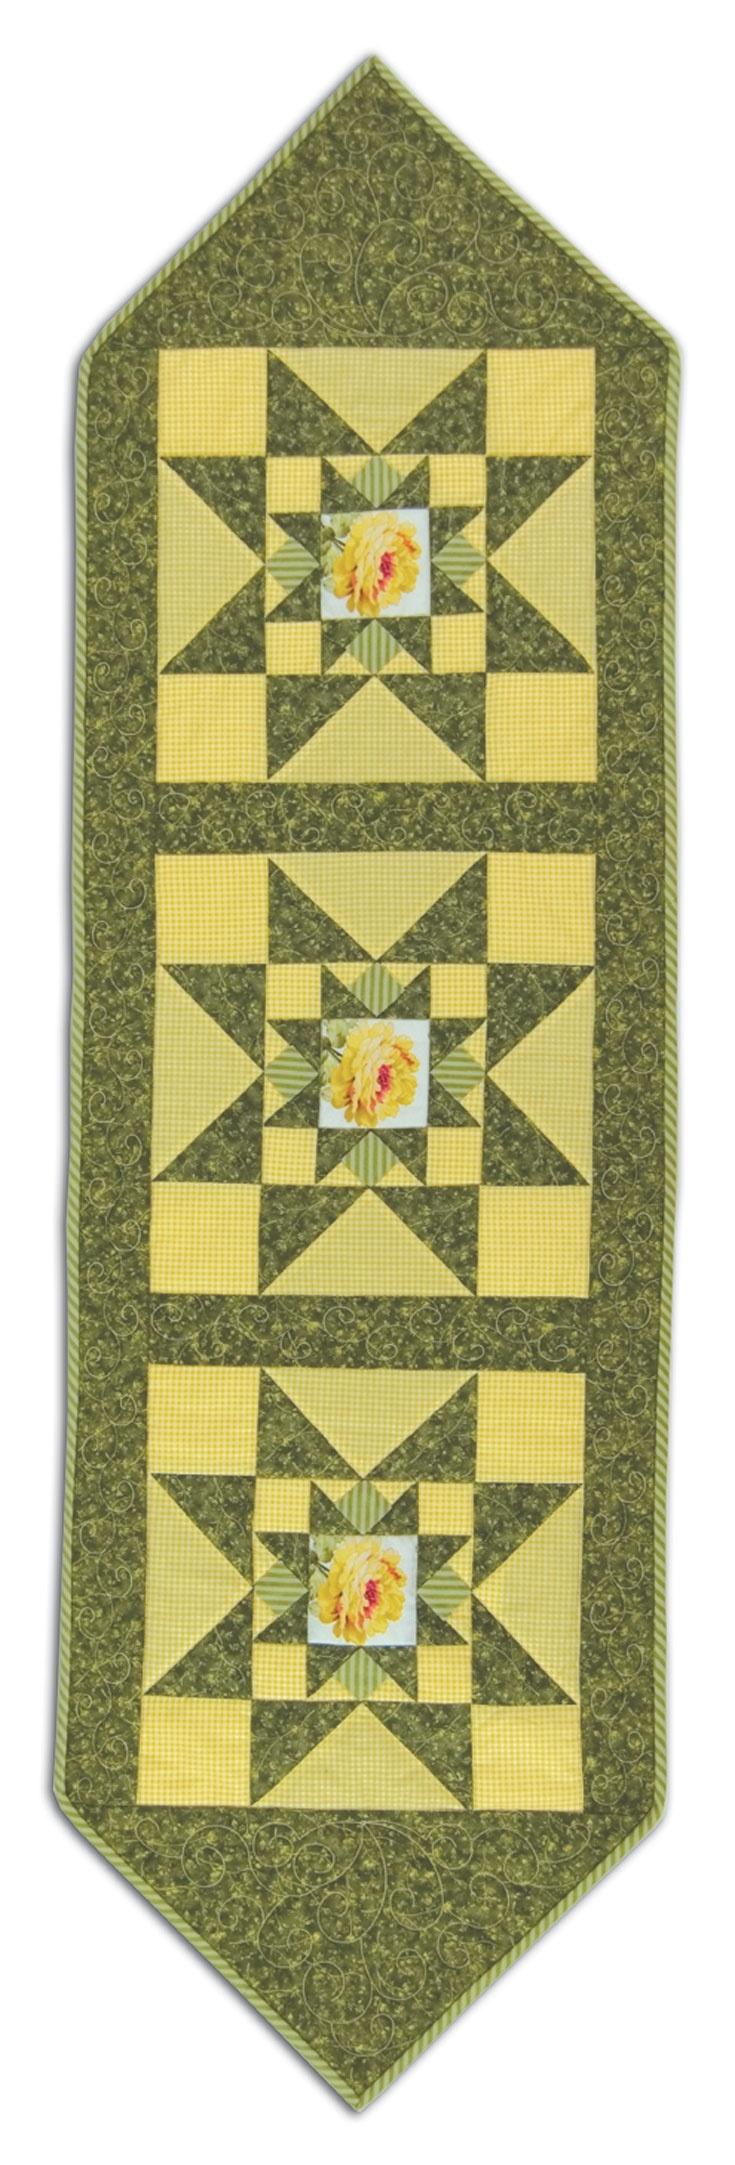 patchwork mysteries books   eBay